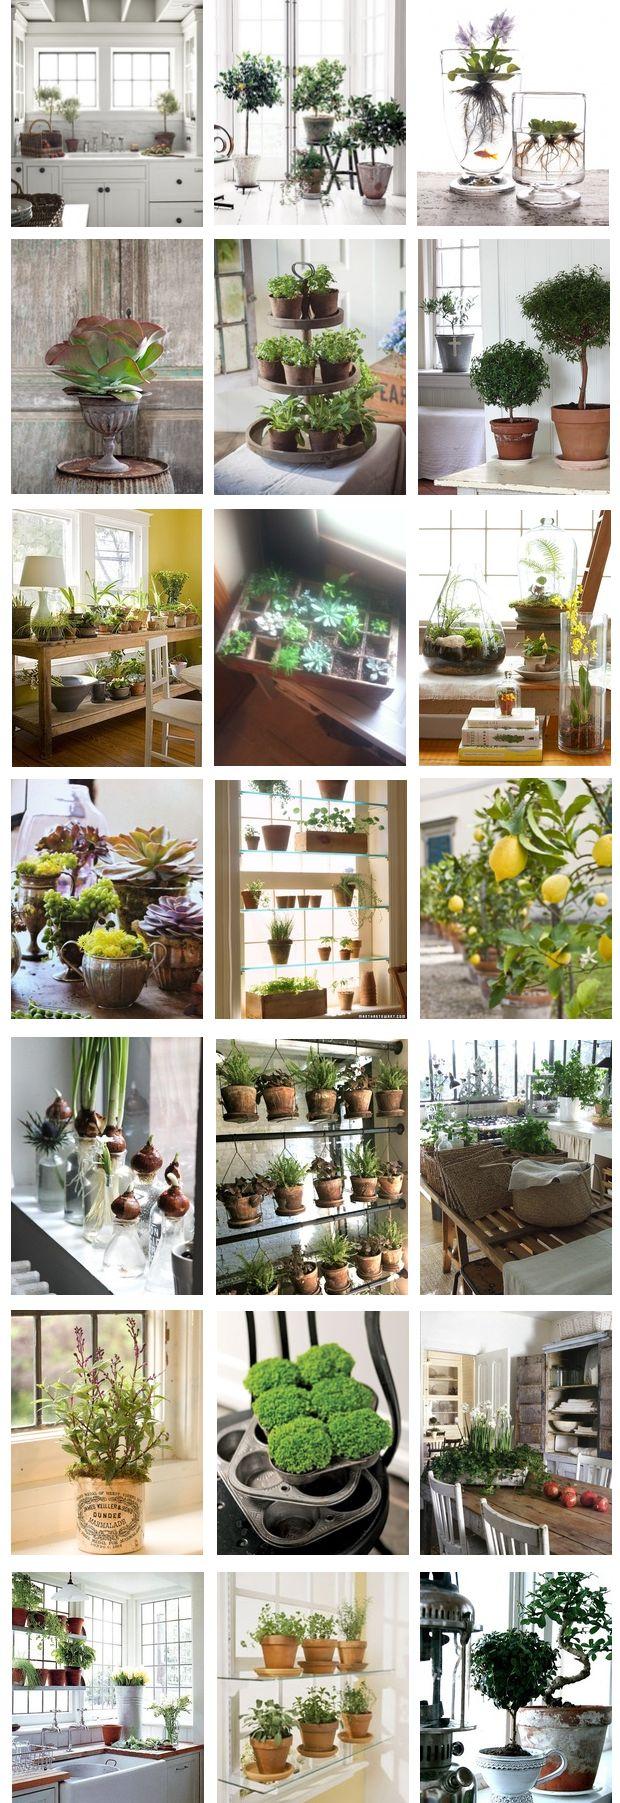 Potted Plants, Potted Plants Inside, Gardening Inside, Indoor Gardens, Primitive Decorating Ideas,